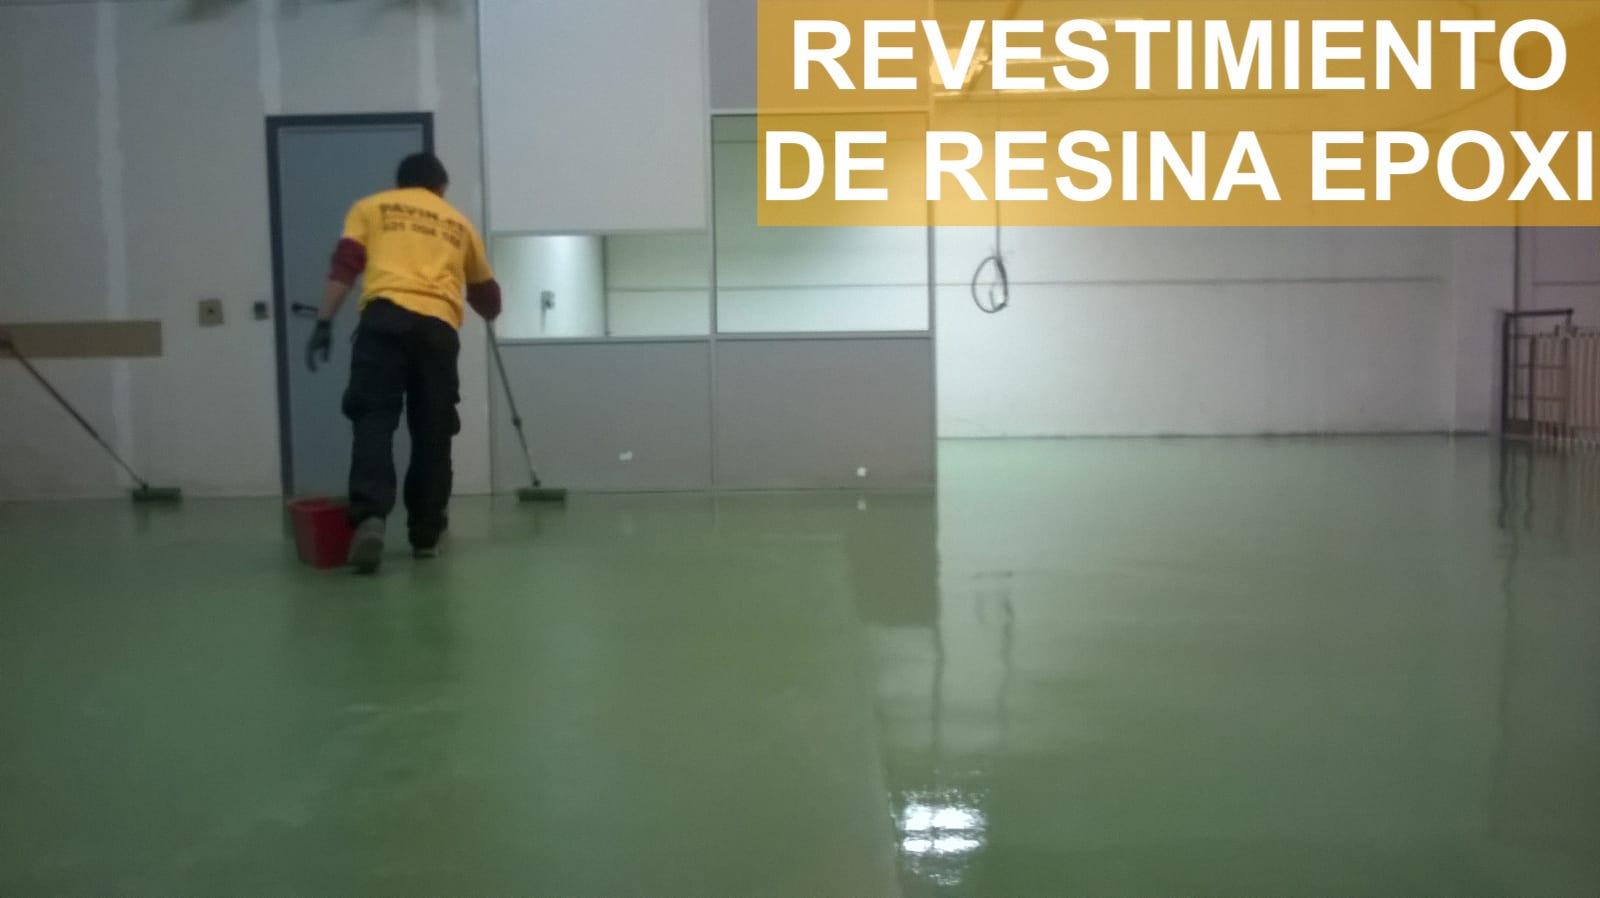 Revestimiento de resina epoxi